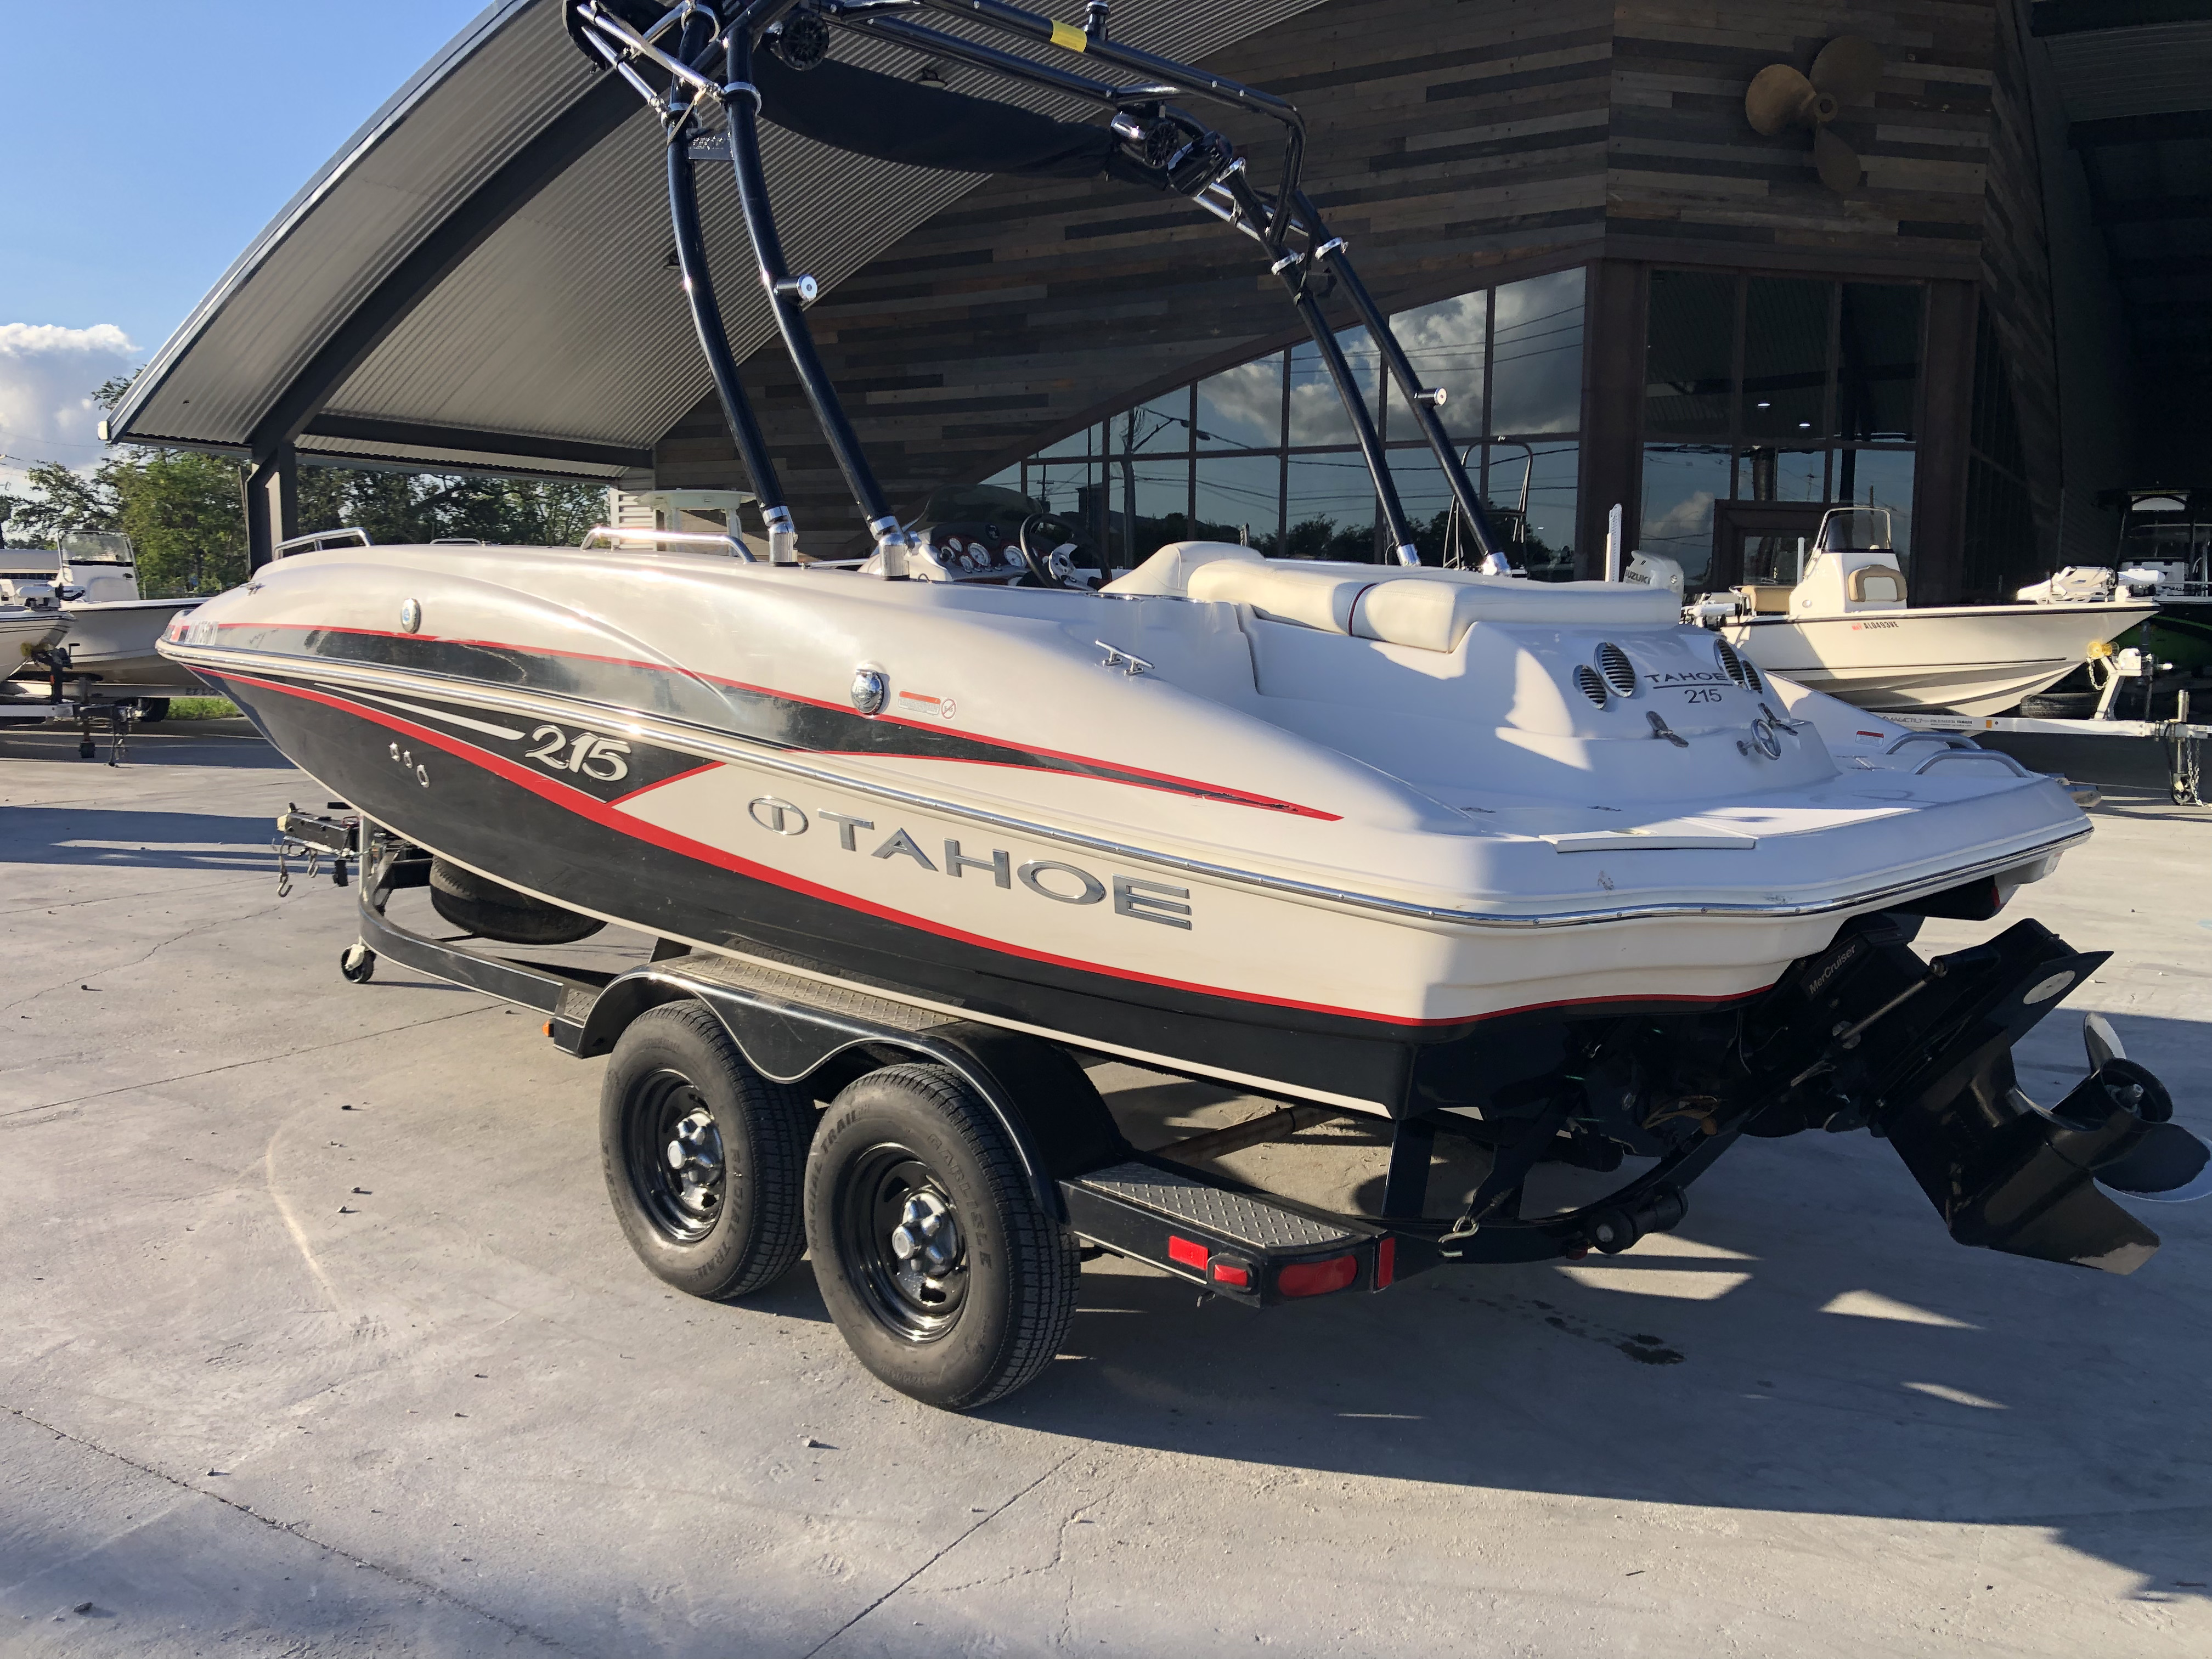 New  2015 Tahoe Boats Deck Boat in Marrero, Louisiana